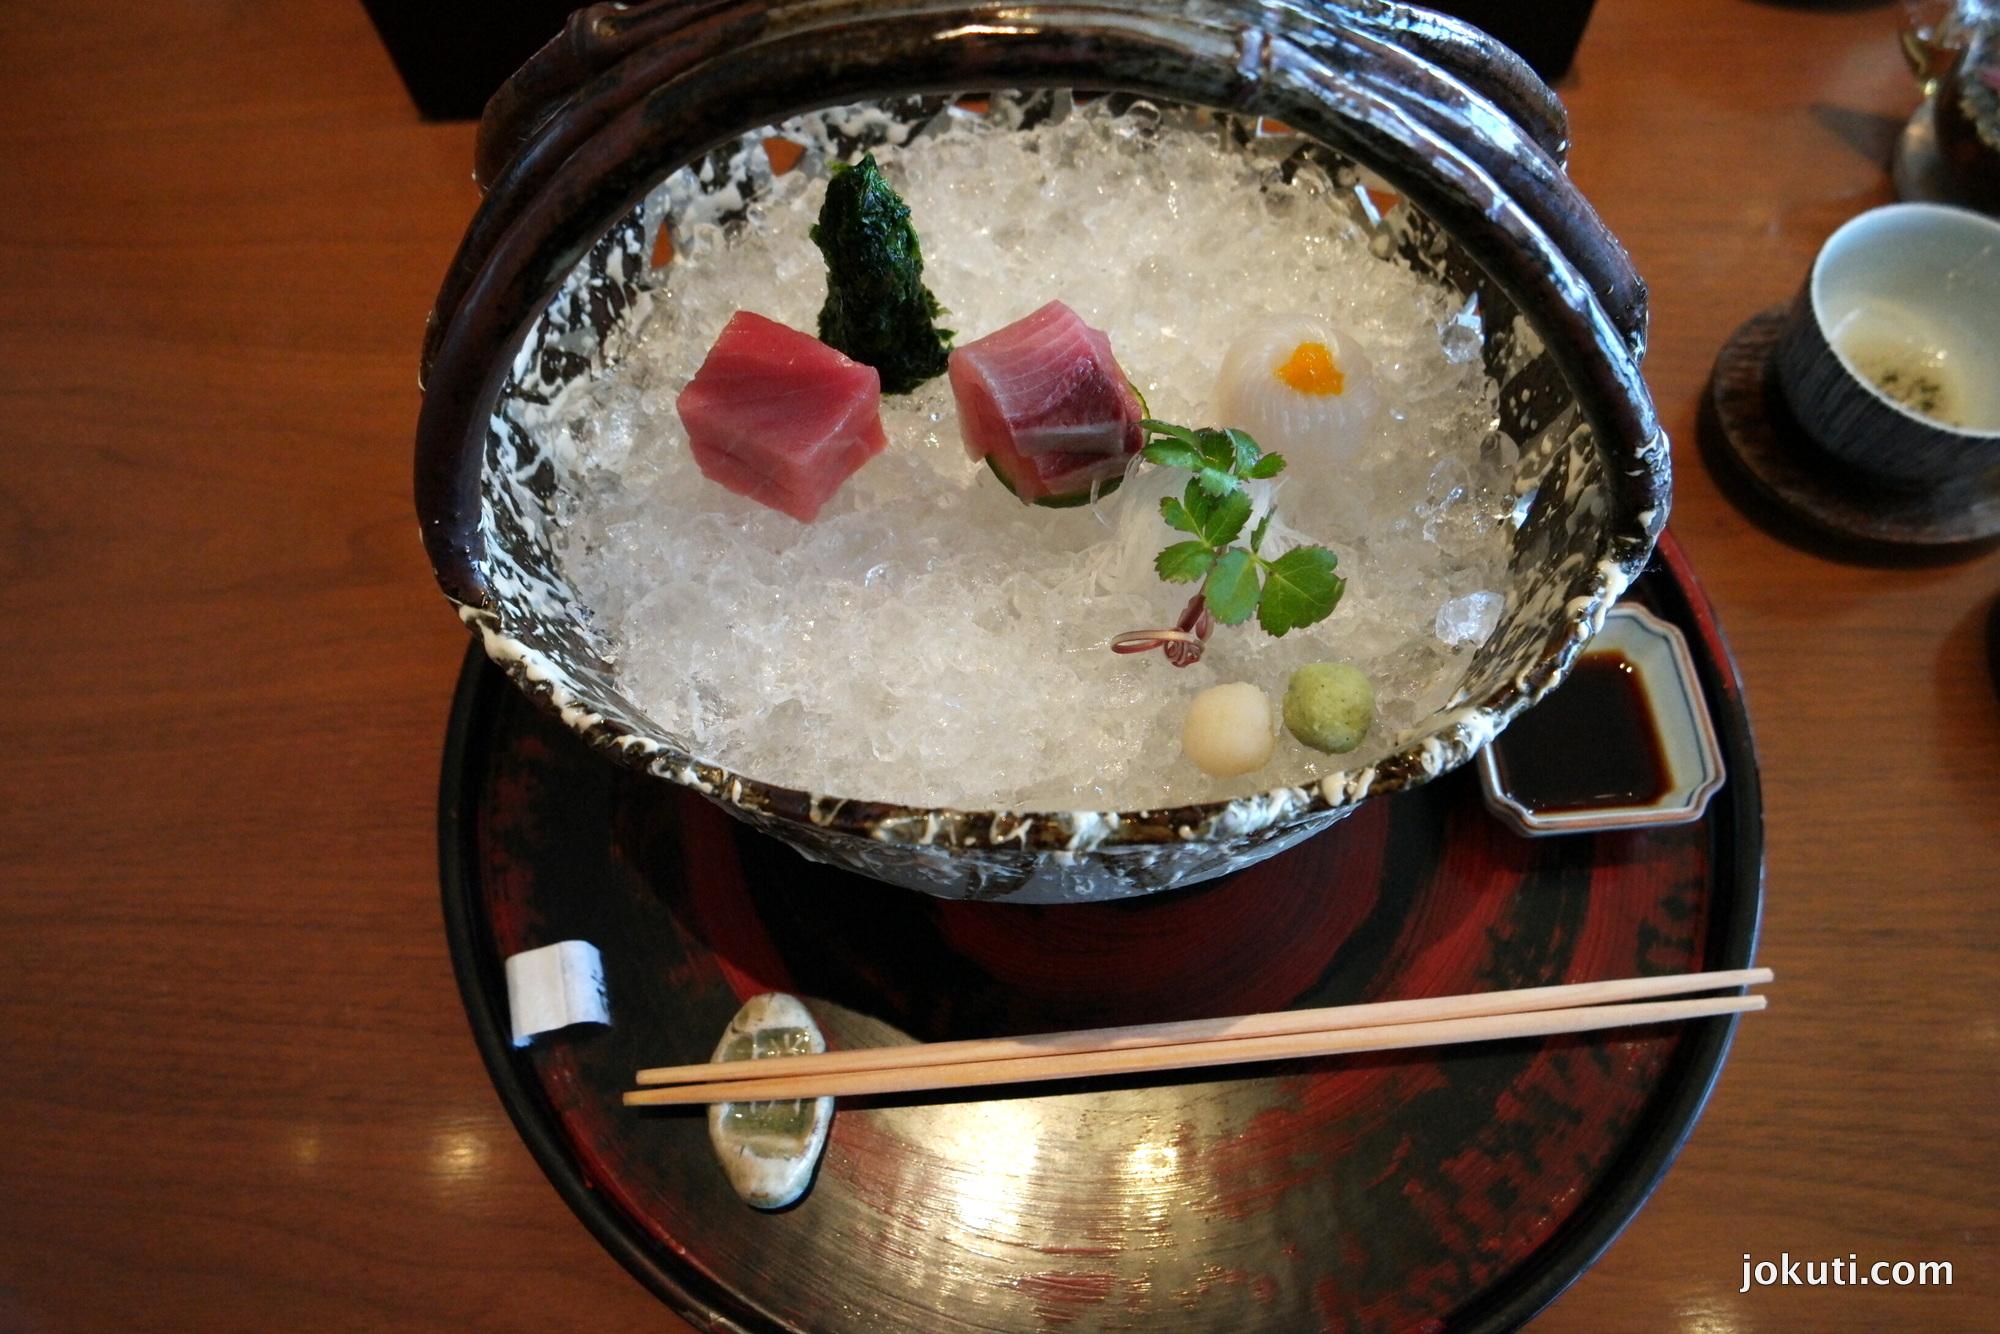 Red tuna, yellowtail, squid sashimi